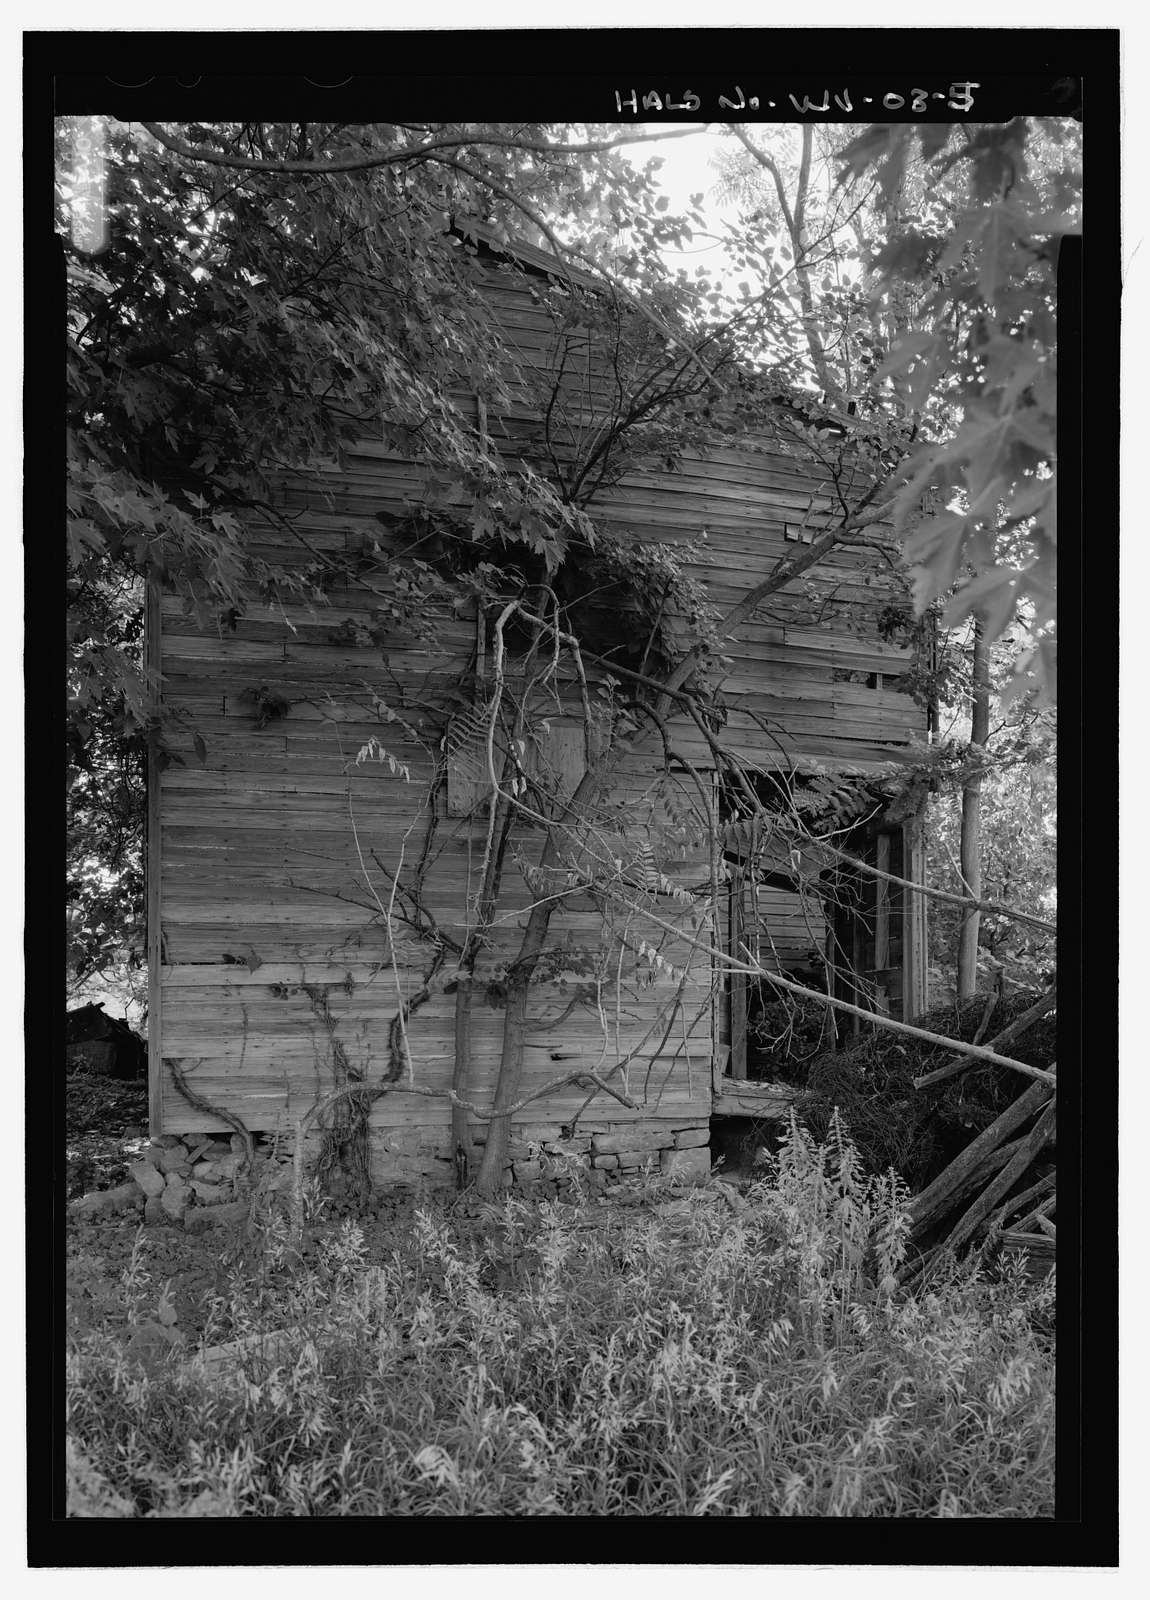 Jacob Furl Henkle Farmstead, West of Millville Road, Harpers Ferry, Jefferson County, WV